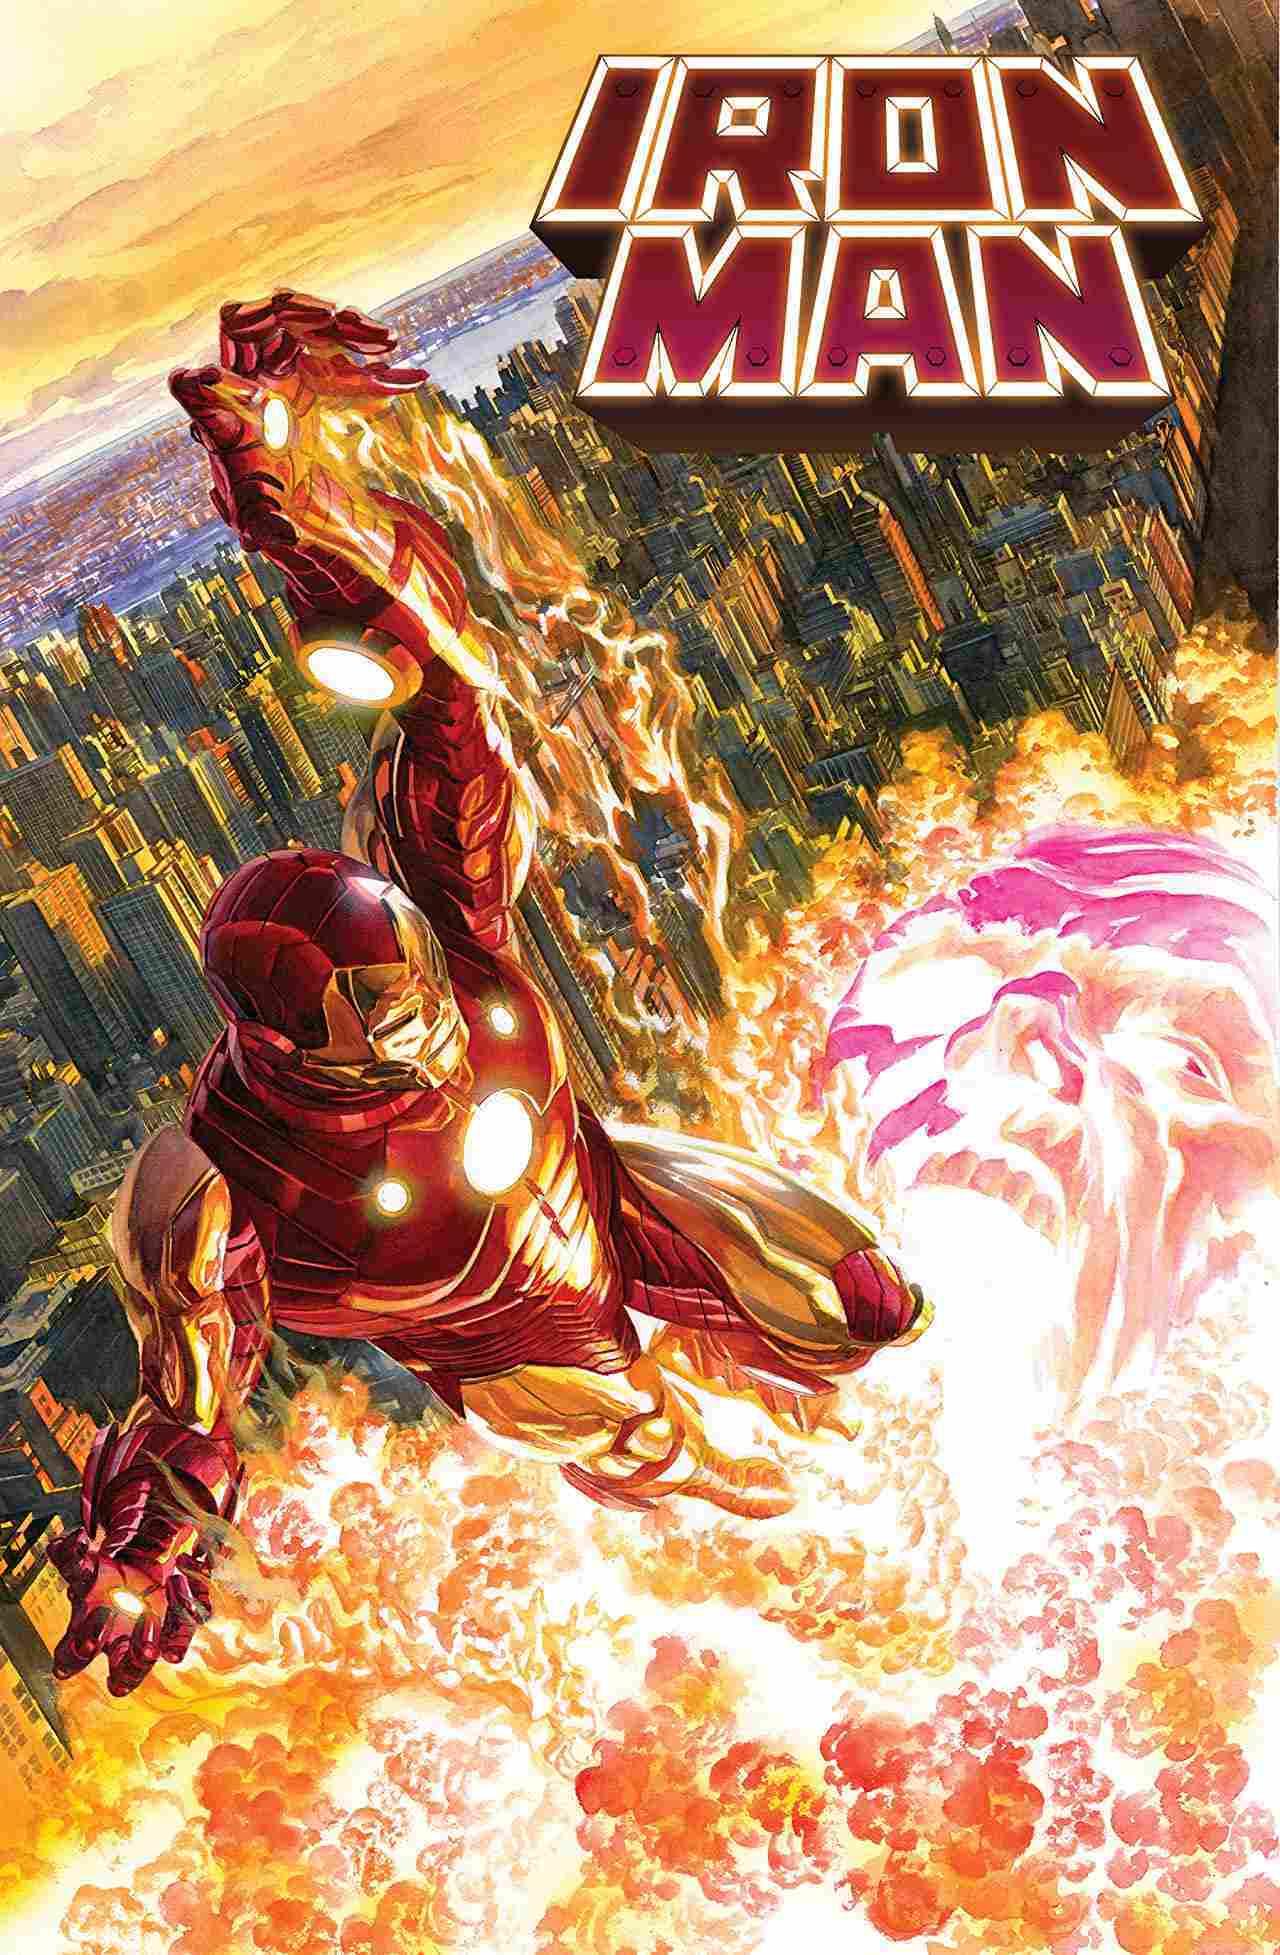 Iron Man Vol 1 Big Iron